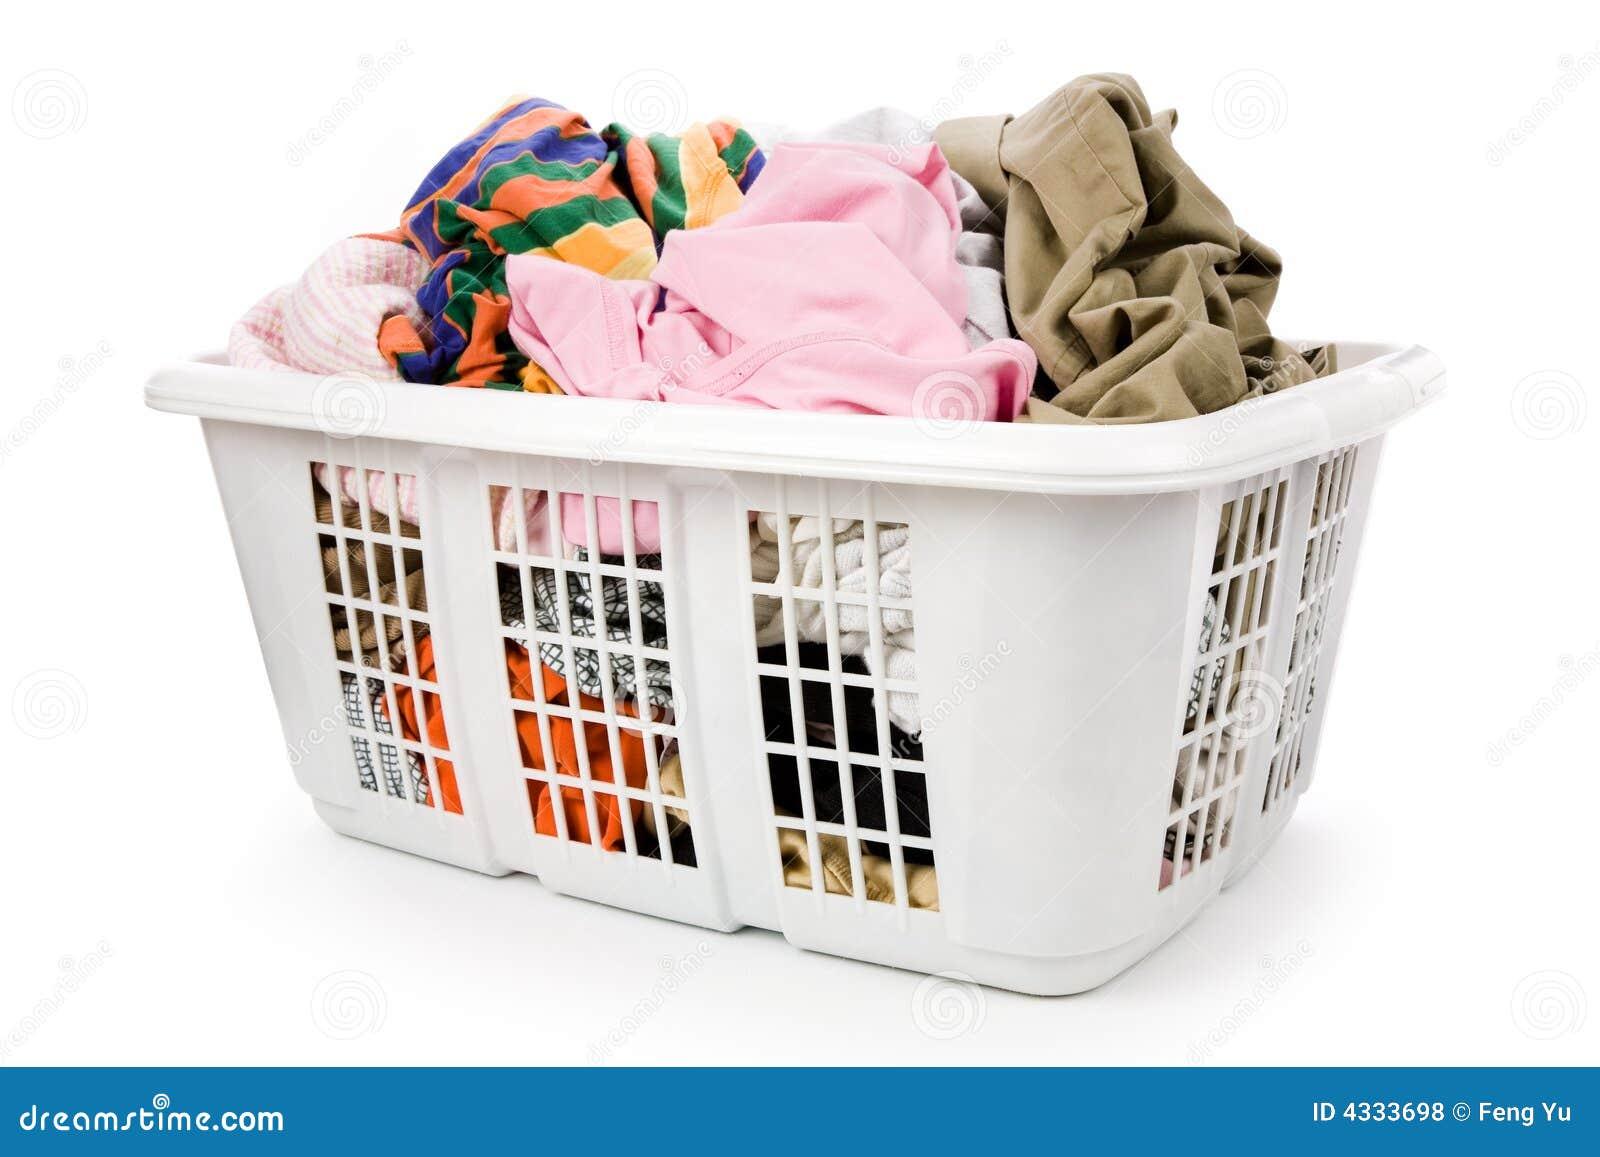 Cesta de lavadero y ropa sucia - Cesta ropa sucia ...